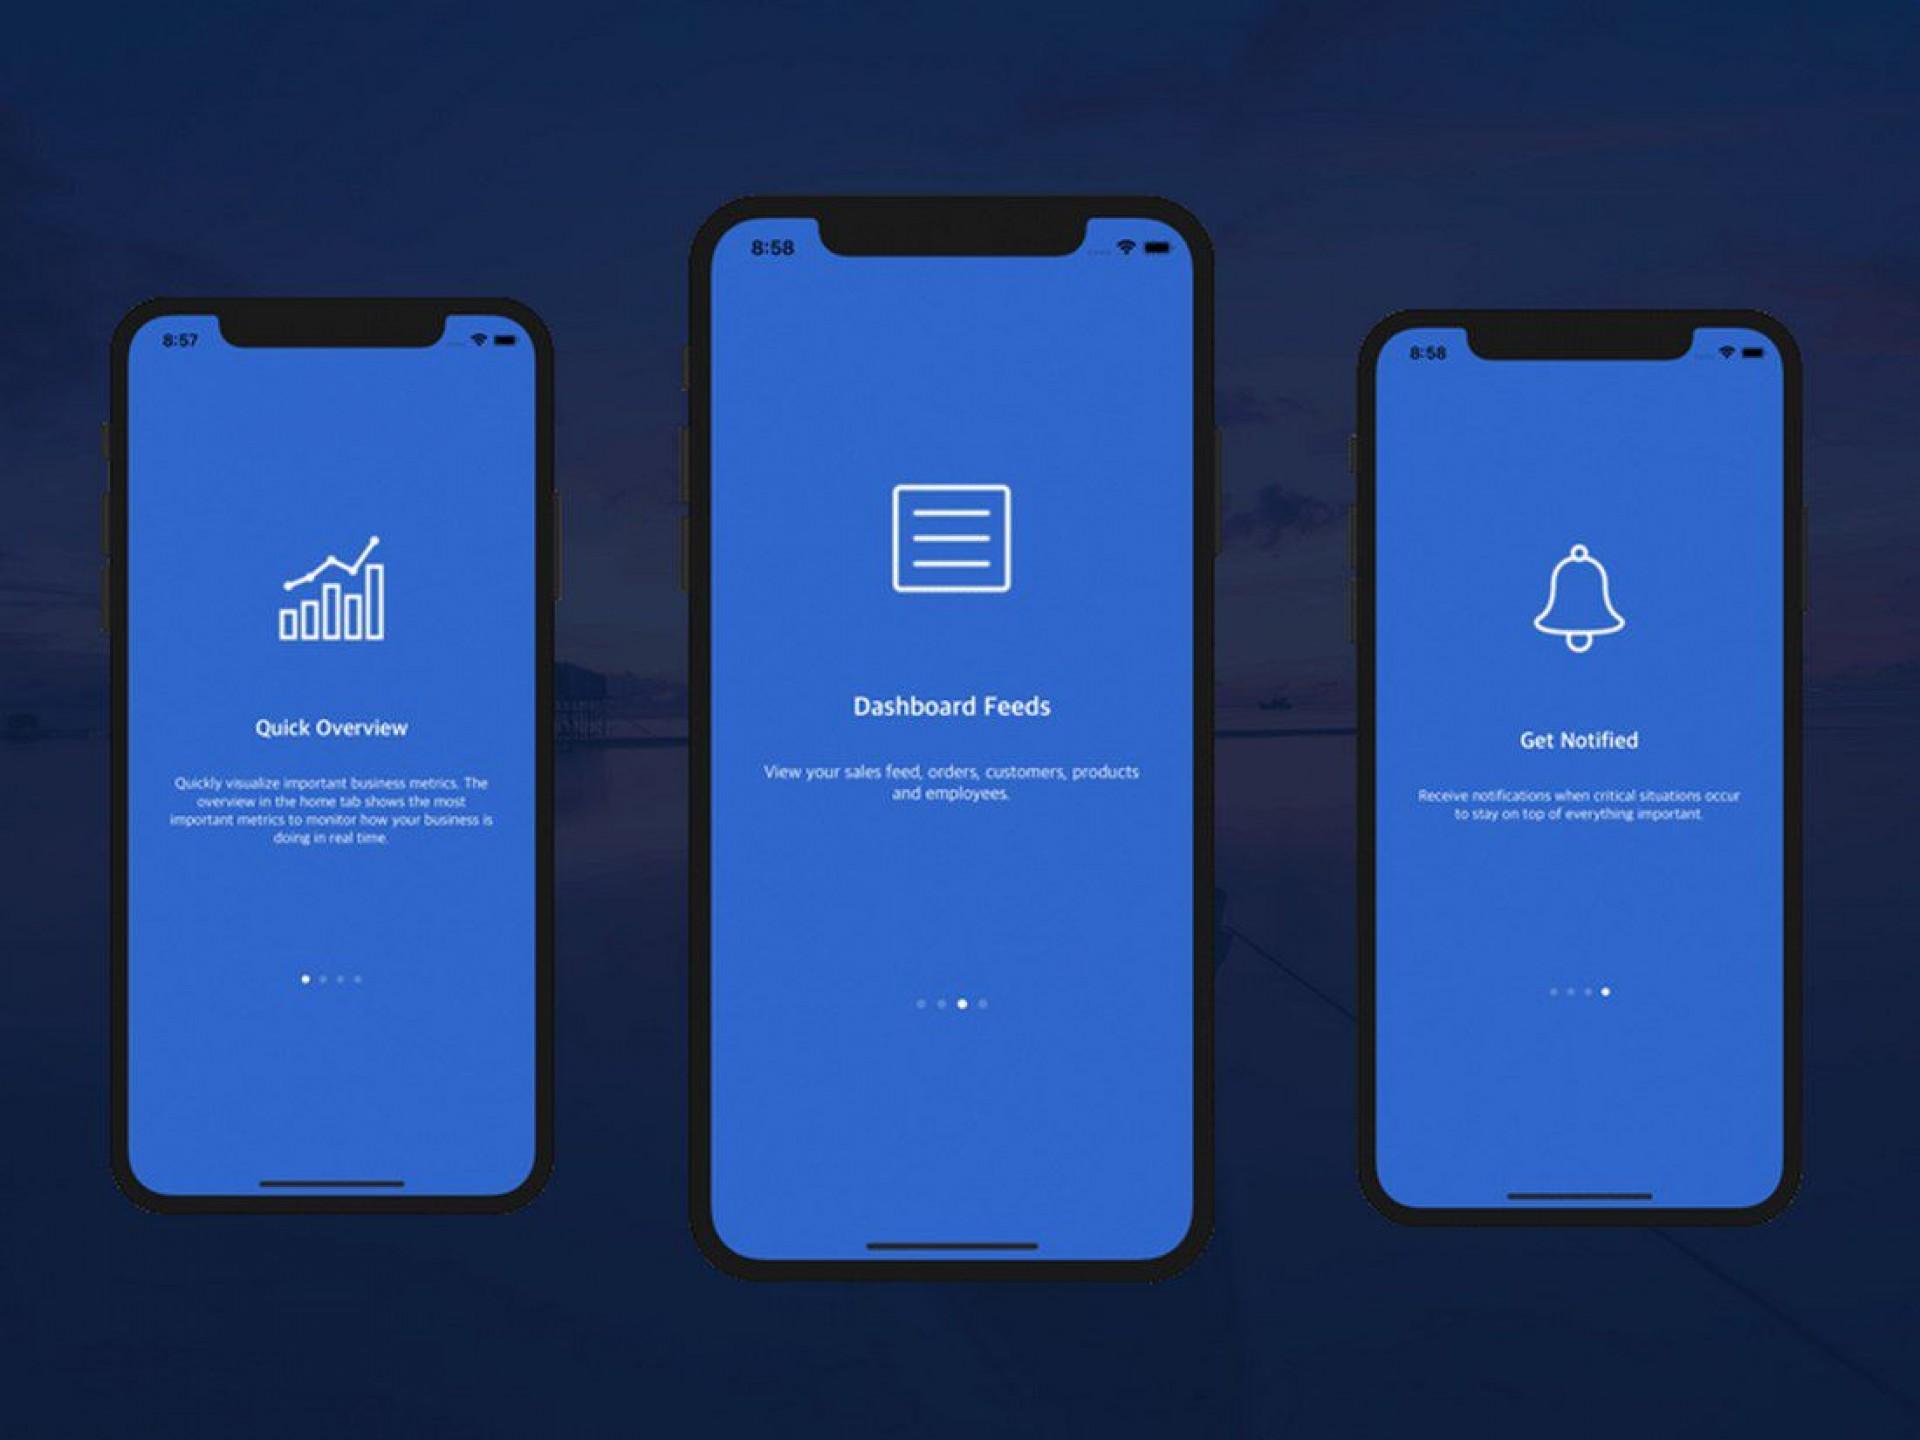 004 Top Iphone App Design Template Concept  X Io Sketch1920